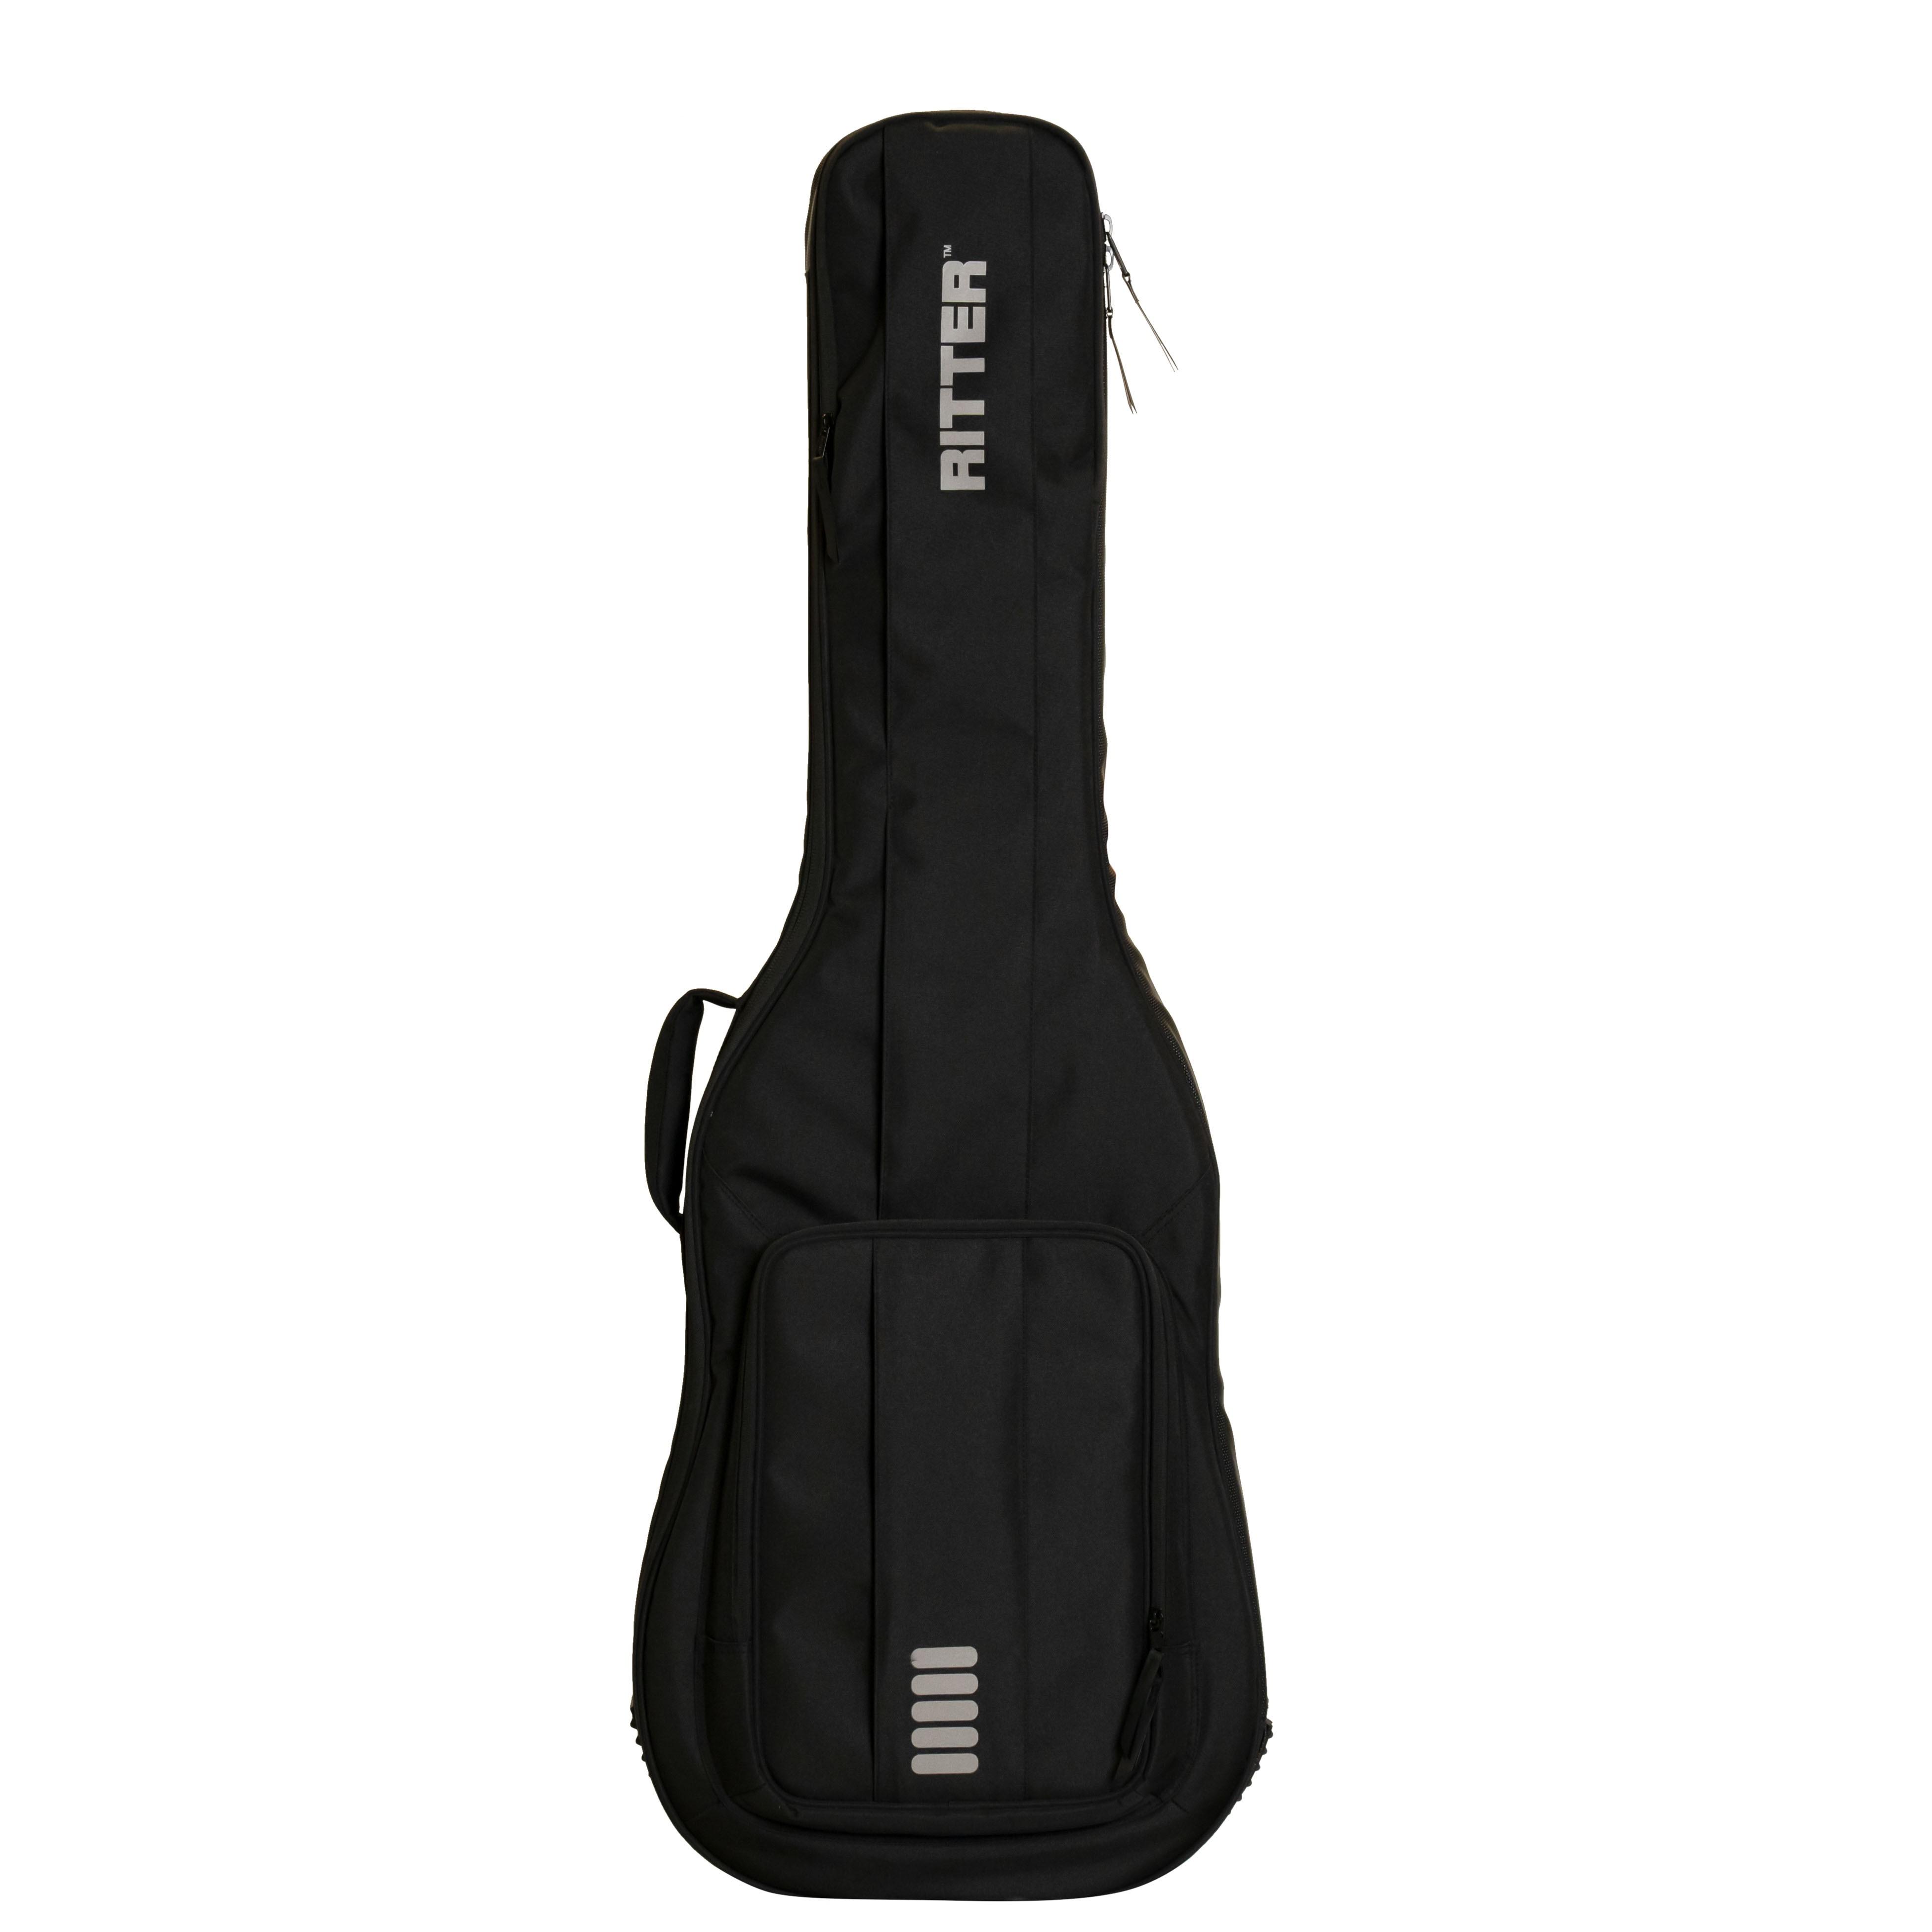 Ritter Arosa Electric Bass Guitar Bag - Sea Ground Black (RGA5-B)